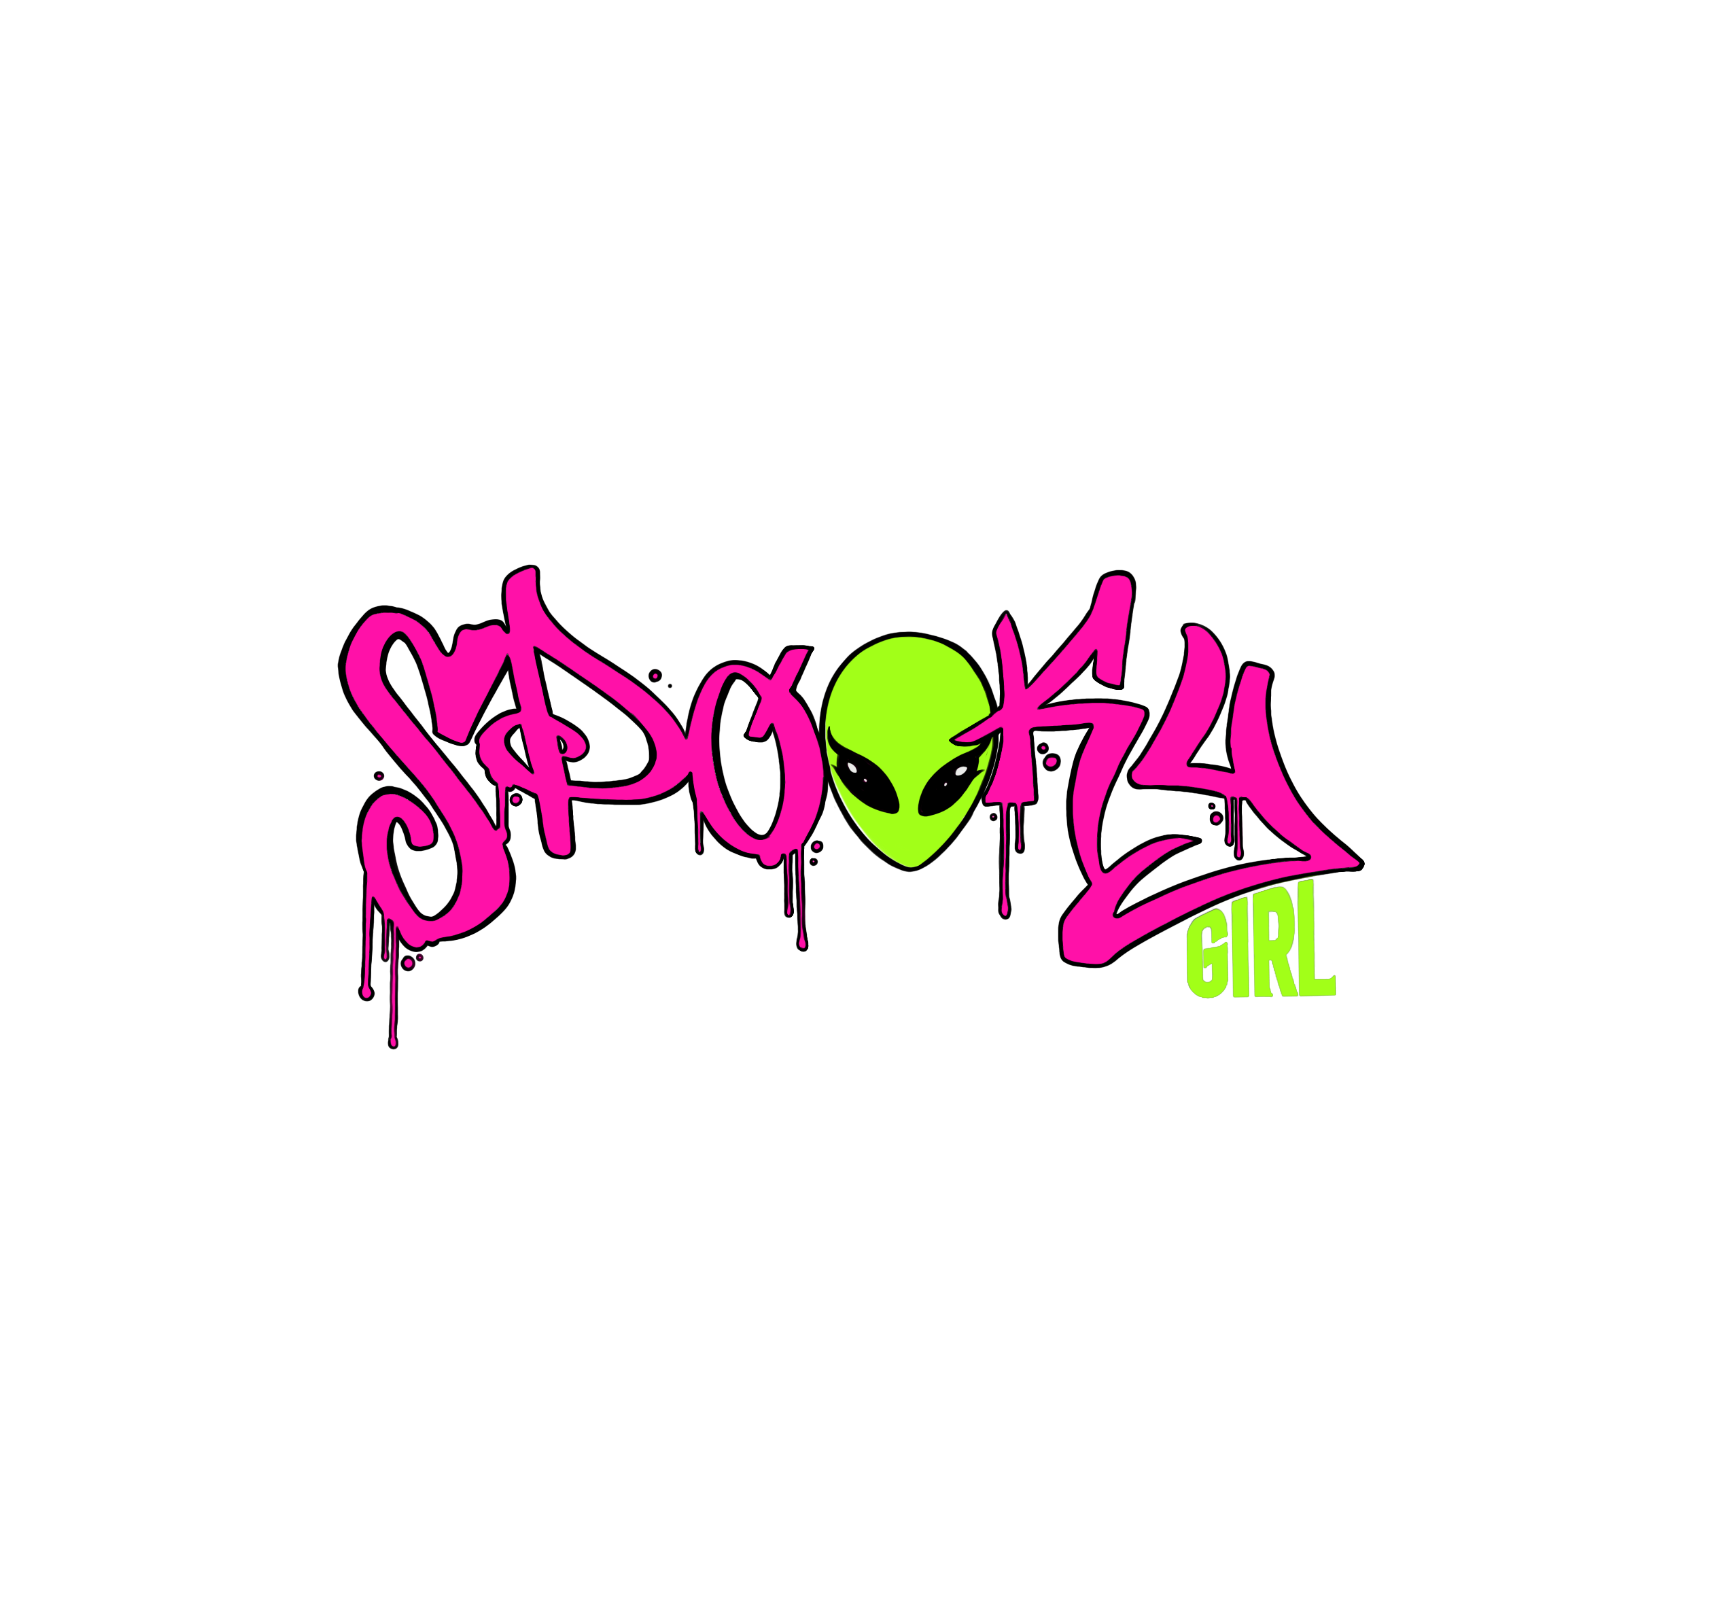 Spookygirlart